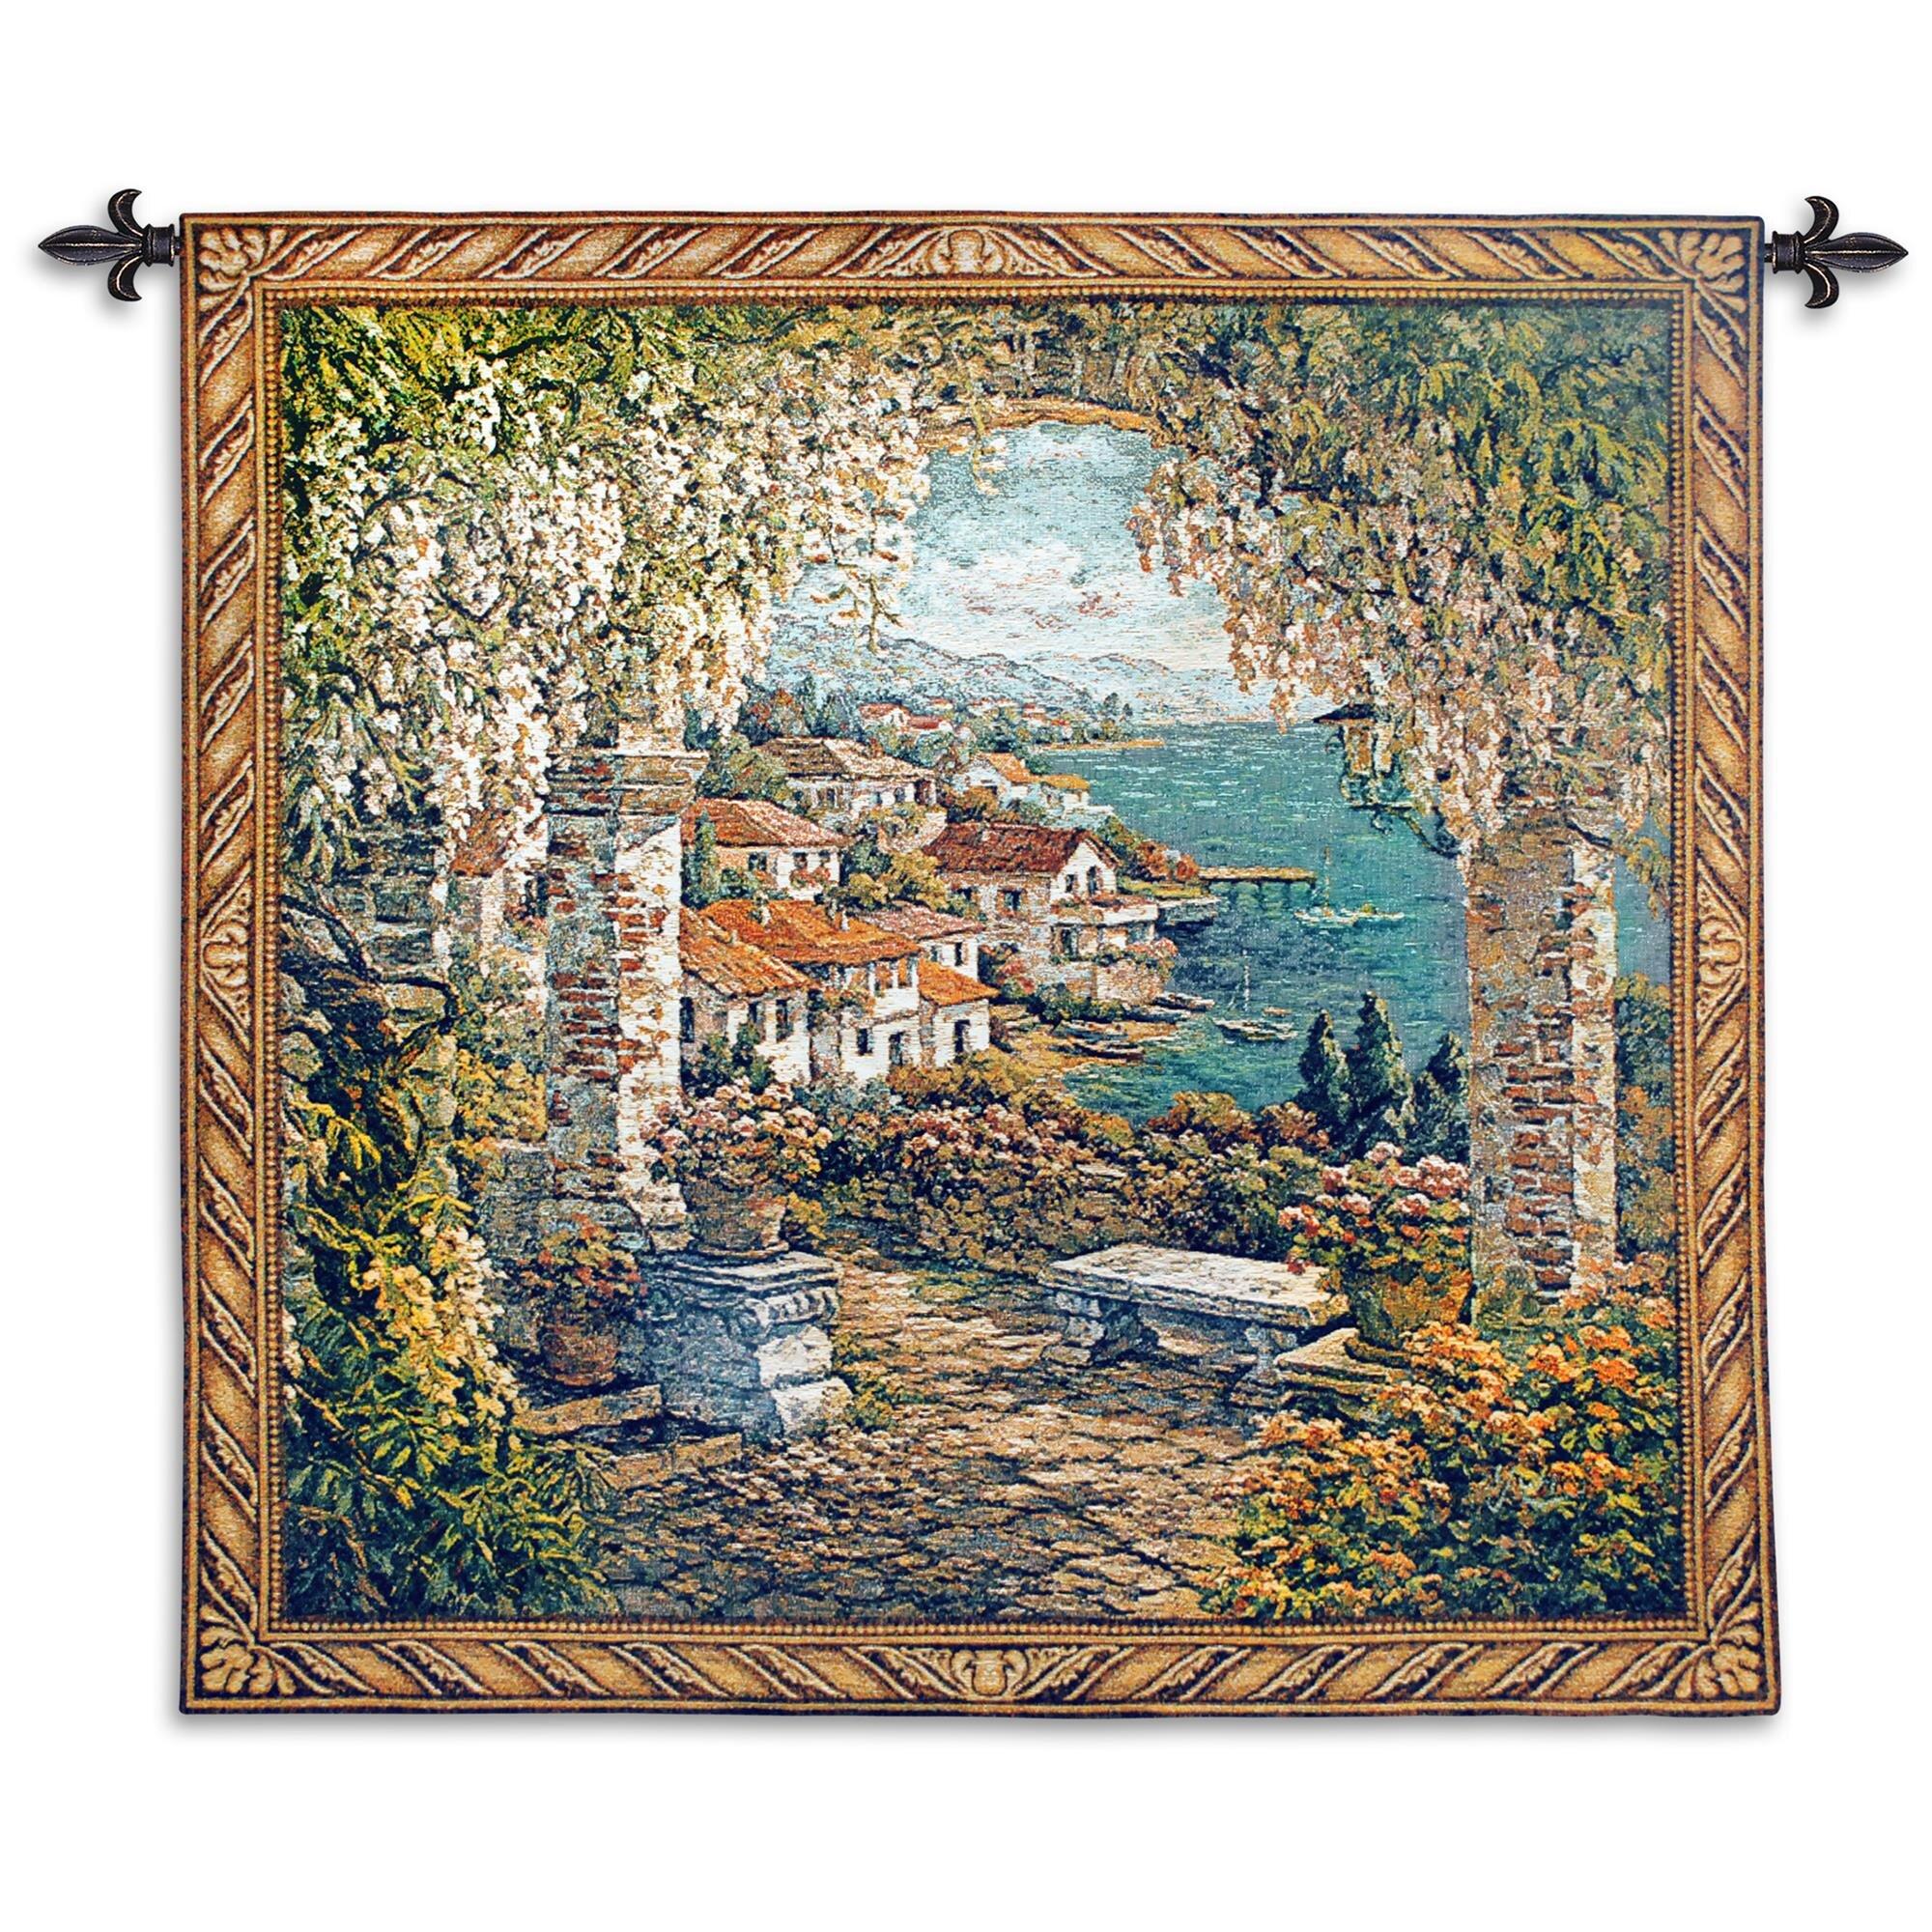 Washable Fleur De Lis Living Tapestries You'll Love In 2021 Regarding Current Blended Fabric Saint Joseph European Tapestries (View 3 of 20)